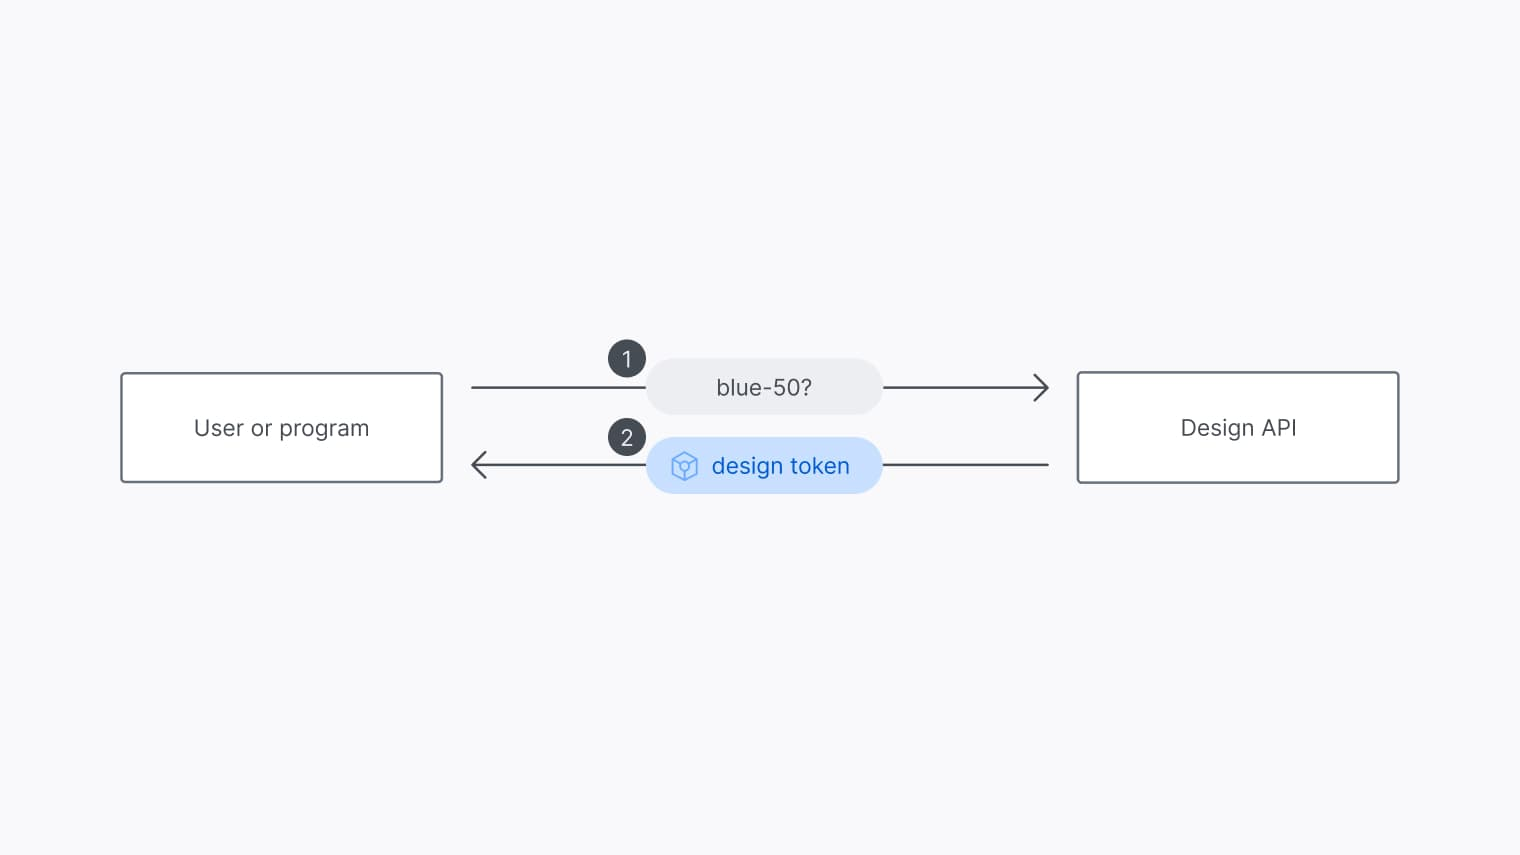 A high-level overview of a design API